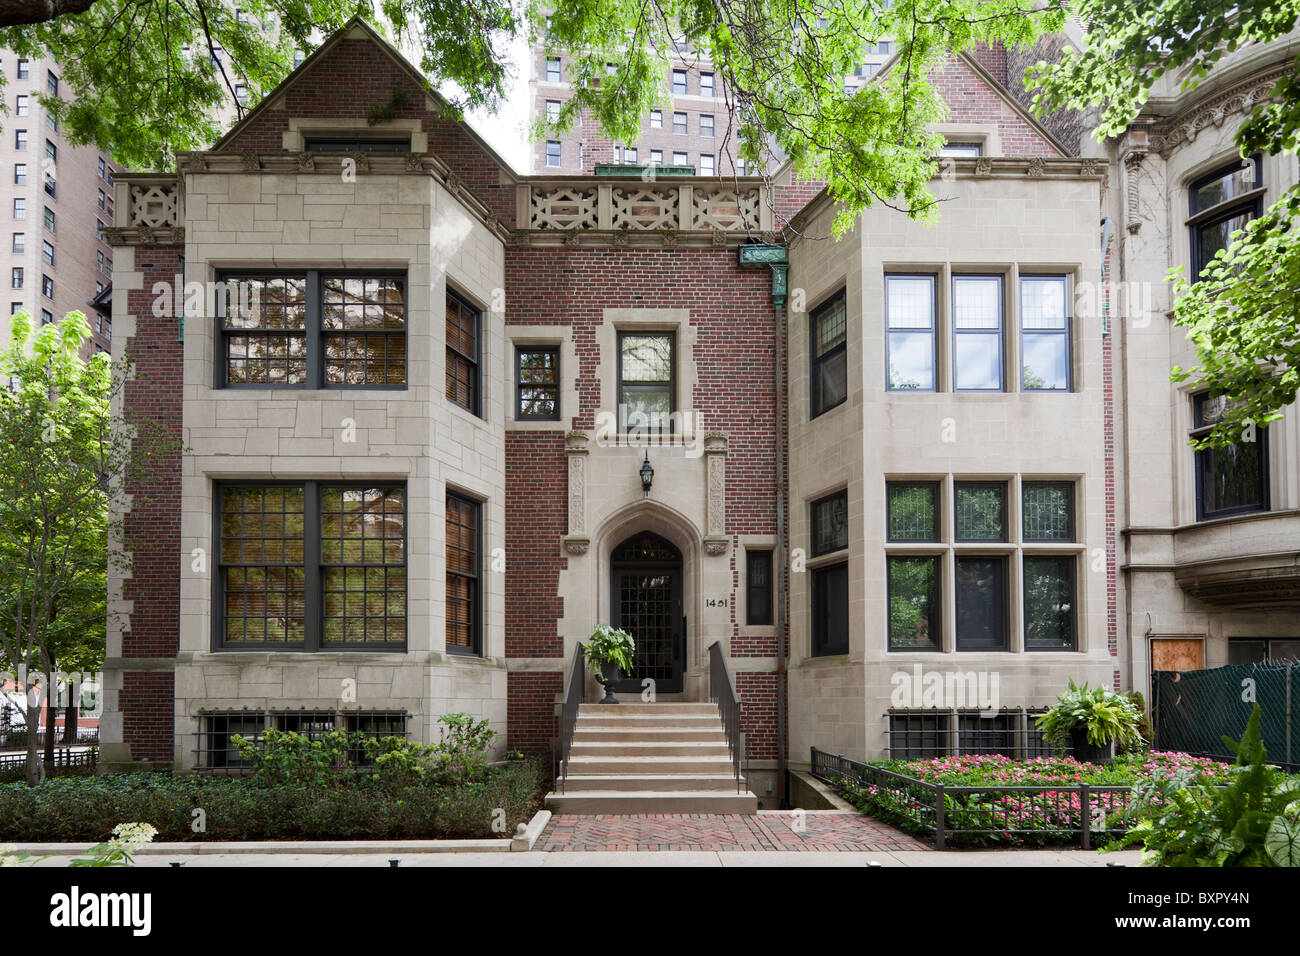 John L. Fortune House, 1451 Astor Street, Chicago, Illinois, USA